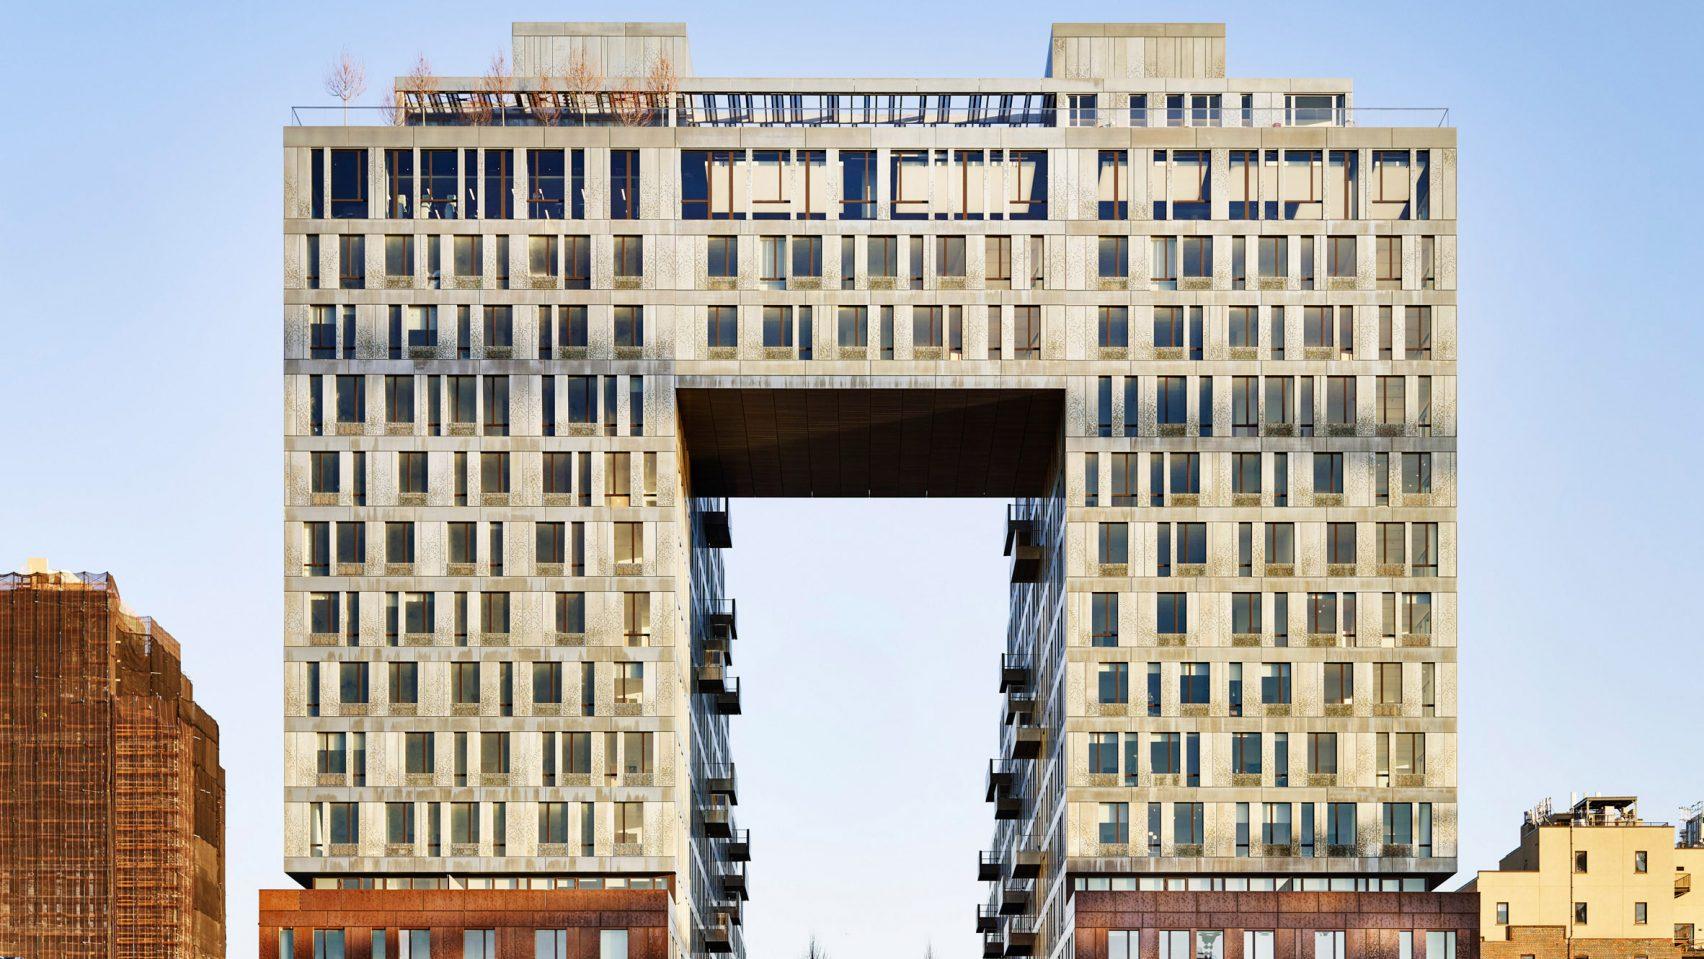 325-kent-shop-architects-brooklyn-noko-01.jpg